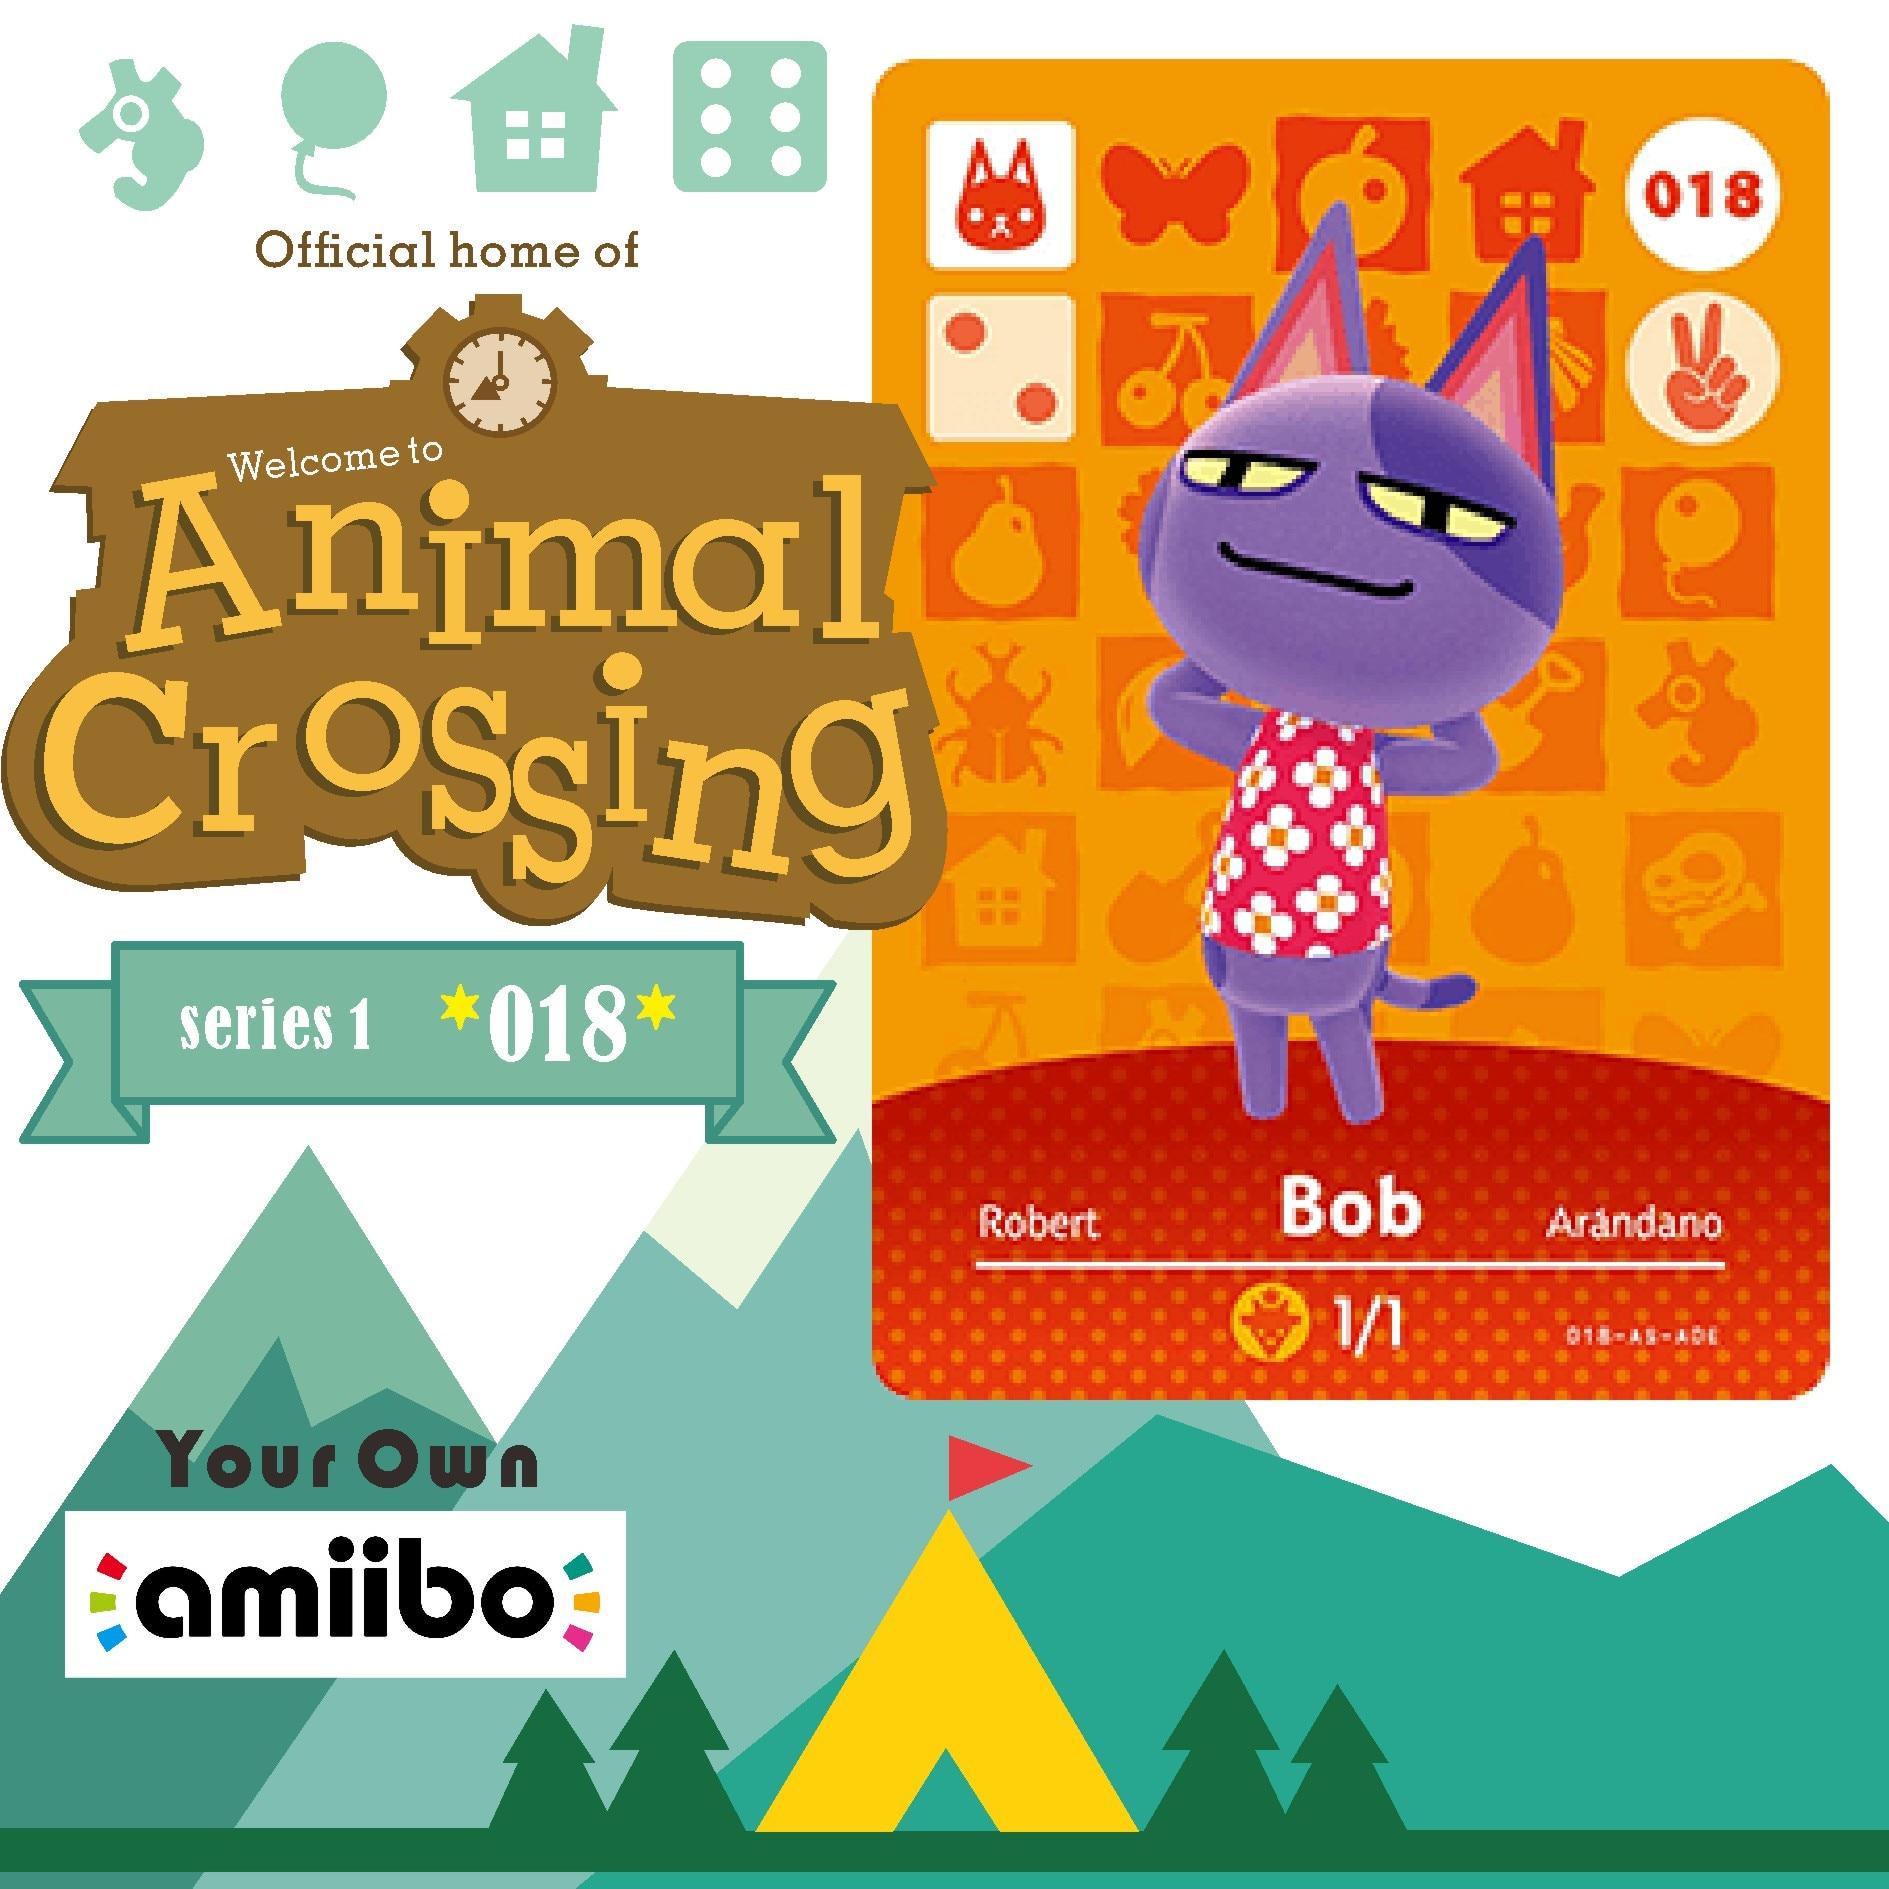 018 Bob Animal Crossing Card Animal Crossing Amiibo Card Bob Amiibo Card Work For Ns Games Amiibo Animal Crossing Nfc Series 1